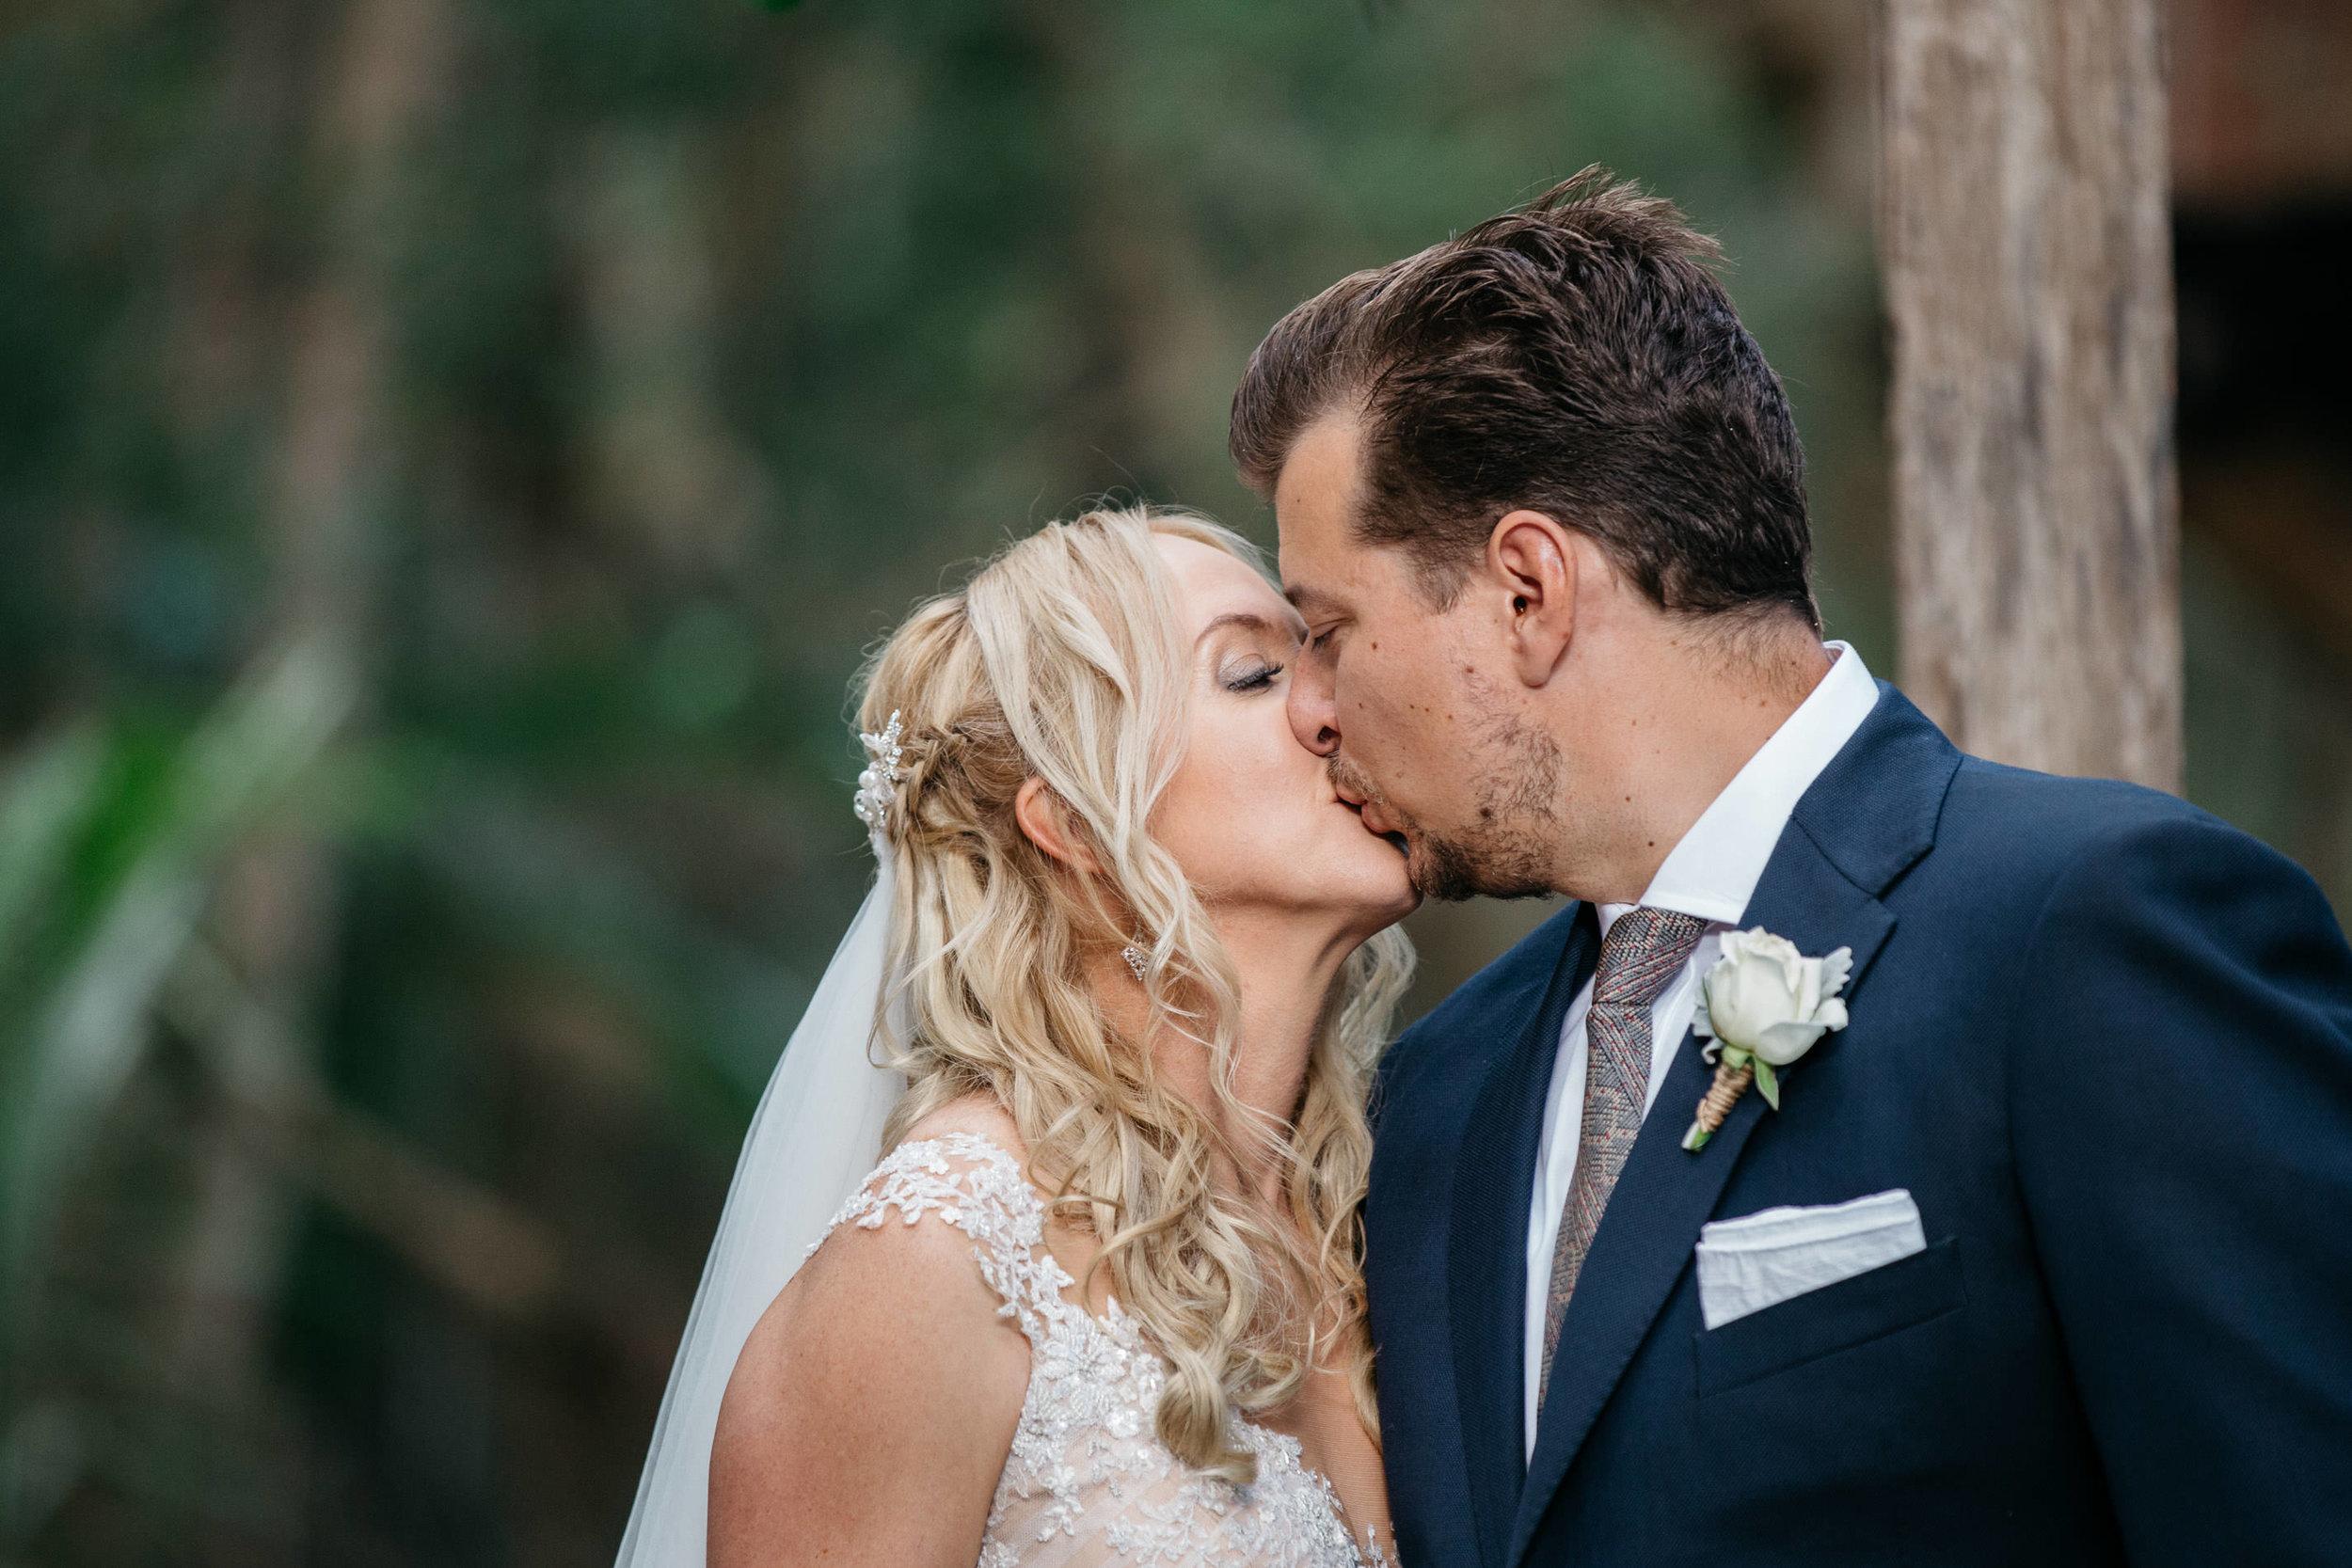 True North Photography_Boomerang Farm_Stacey and Isaac_Gold Coast Wedding_Barm Wedding_Hinterland Wedding-108.jpg